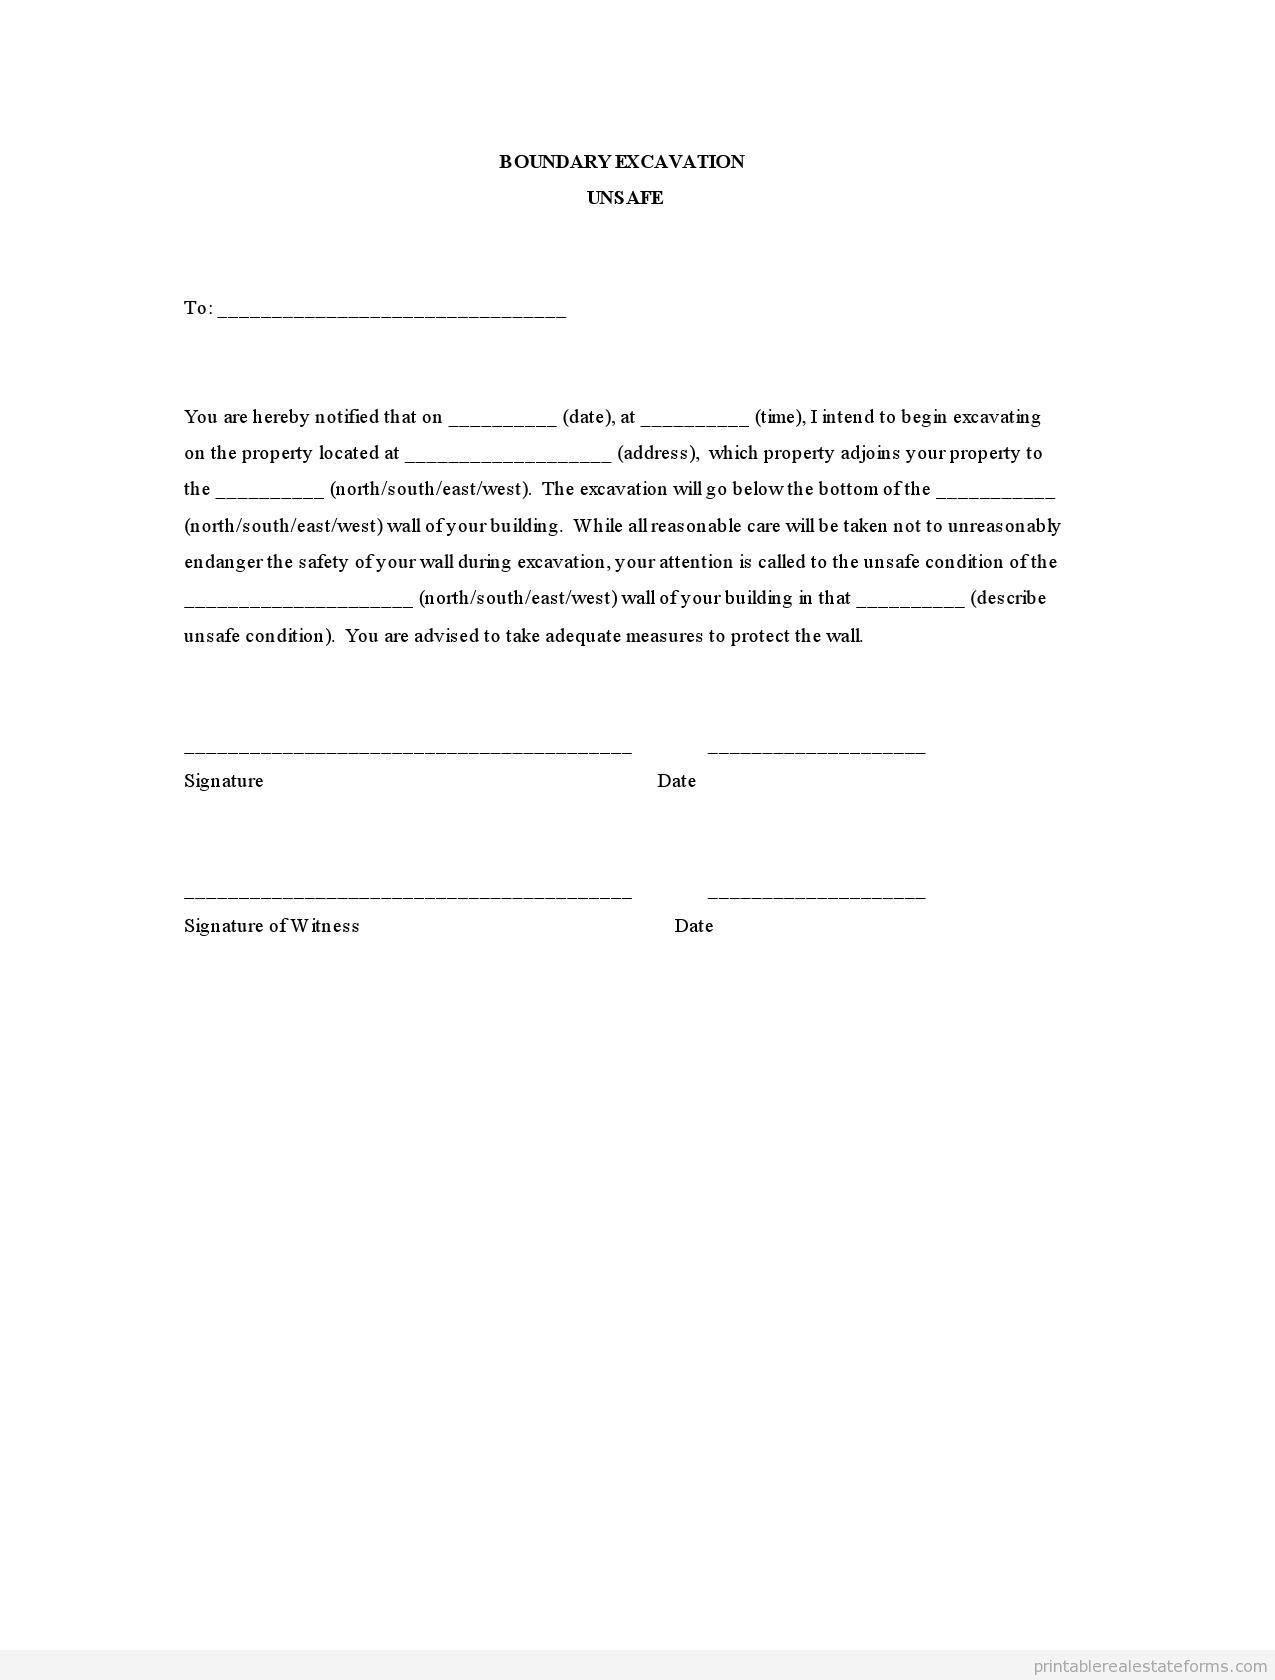 Sample Printable Boundary Excavation Unsafe Form